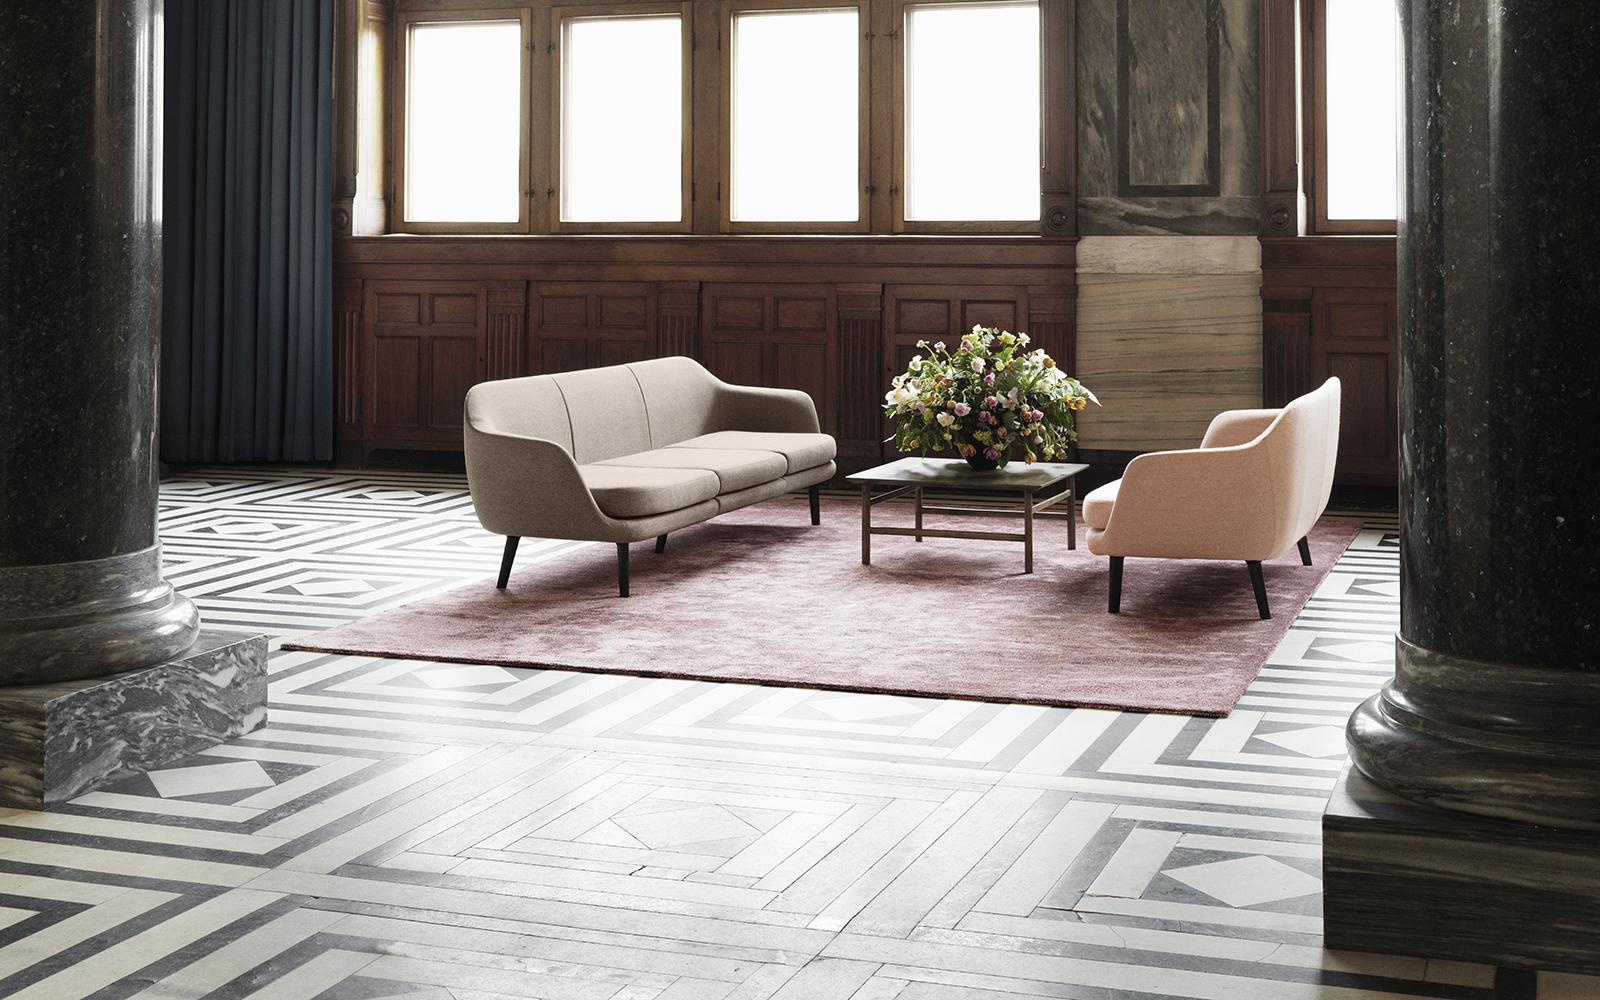 6035_Normann_Copenhagen_Sum_Modular_Sofa_Grow_Table_Confetti_Carpet_01.jpg